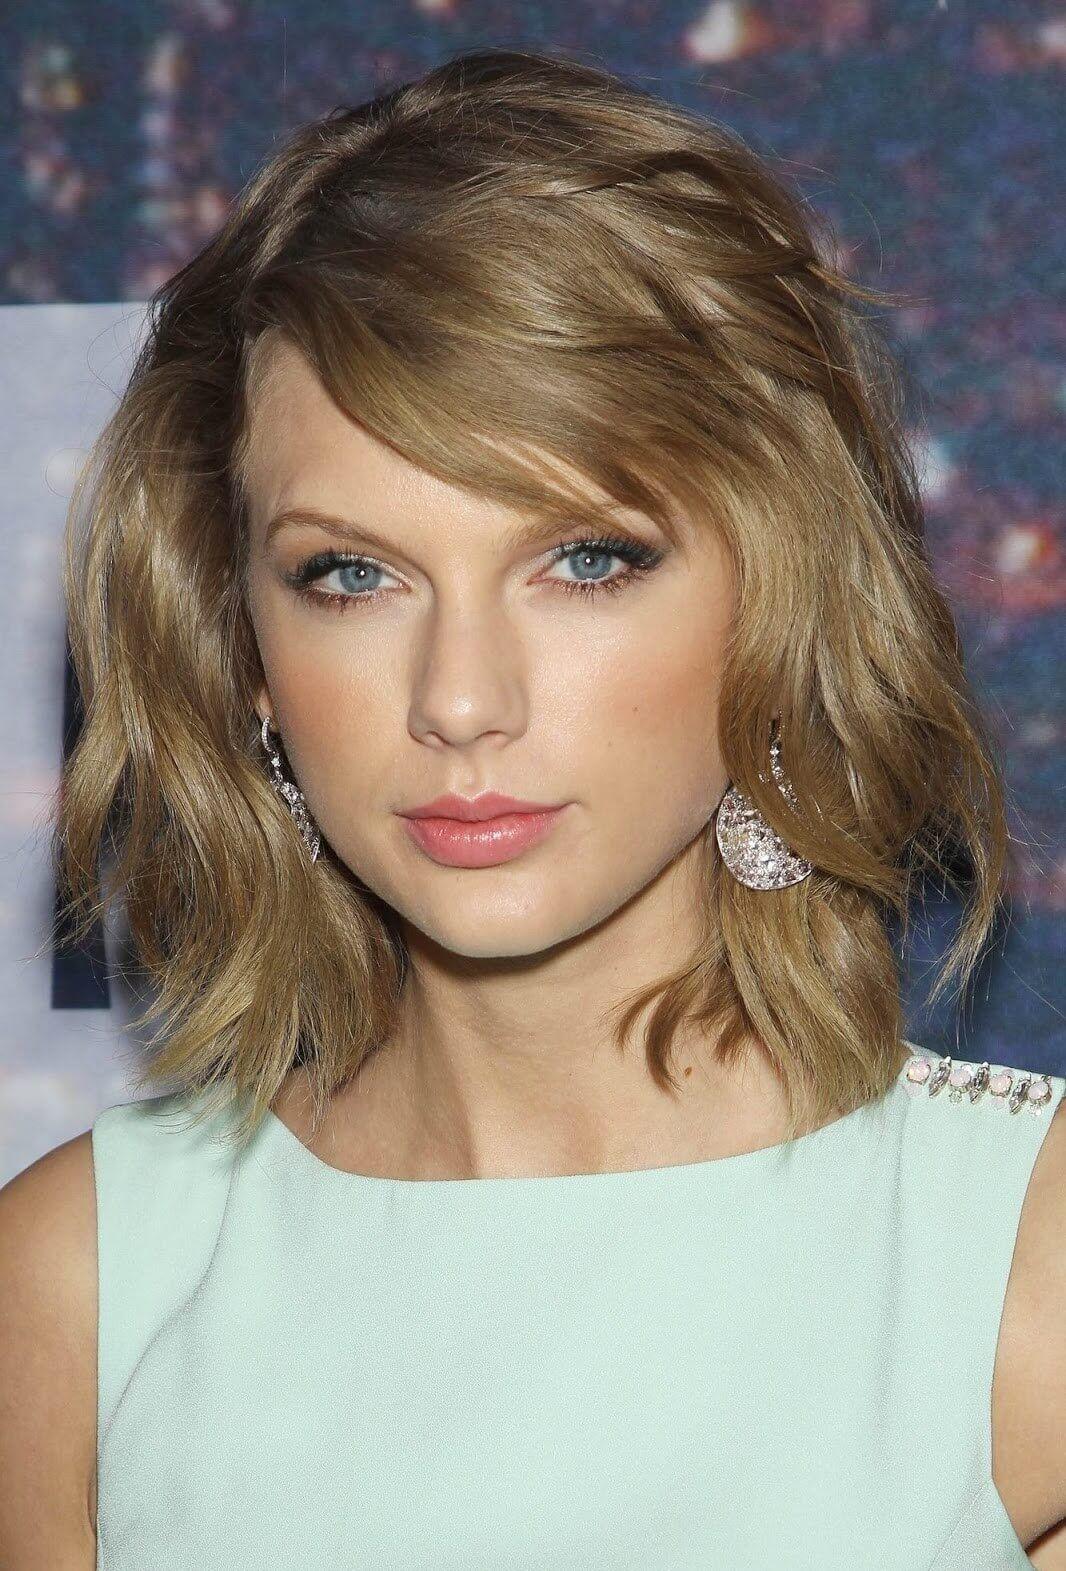 Taylor Swift Haircuts 30 Taylor Swifts Signature Frisuren Haircuts Signature Swift Swifts Taylor Haarschnitt Ideen Haarschnitt Taylor Swift Haarschnitt